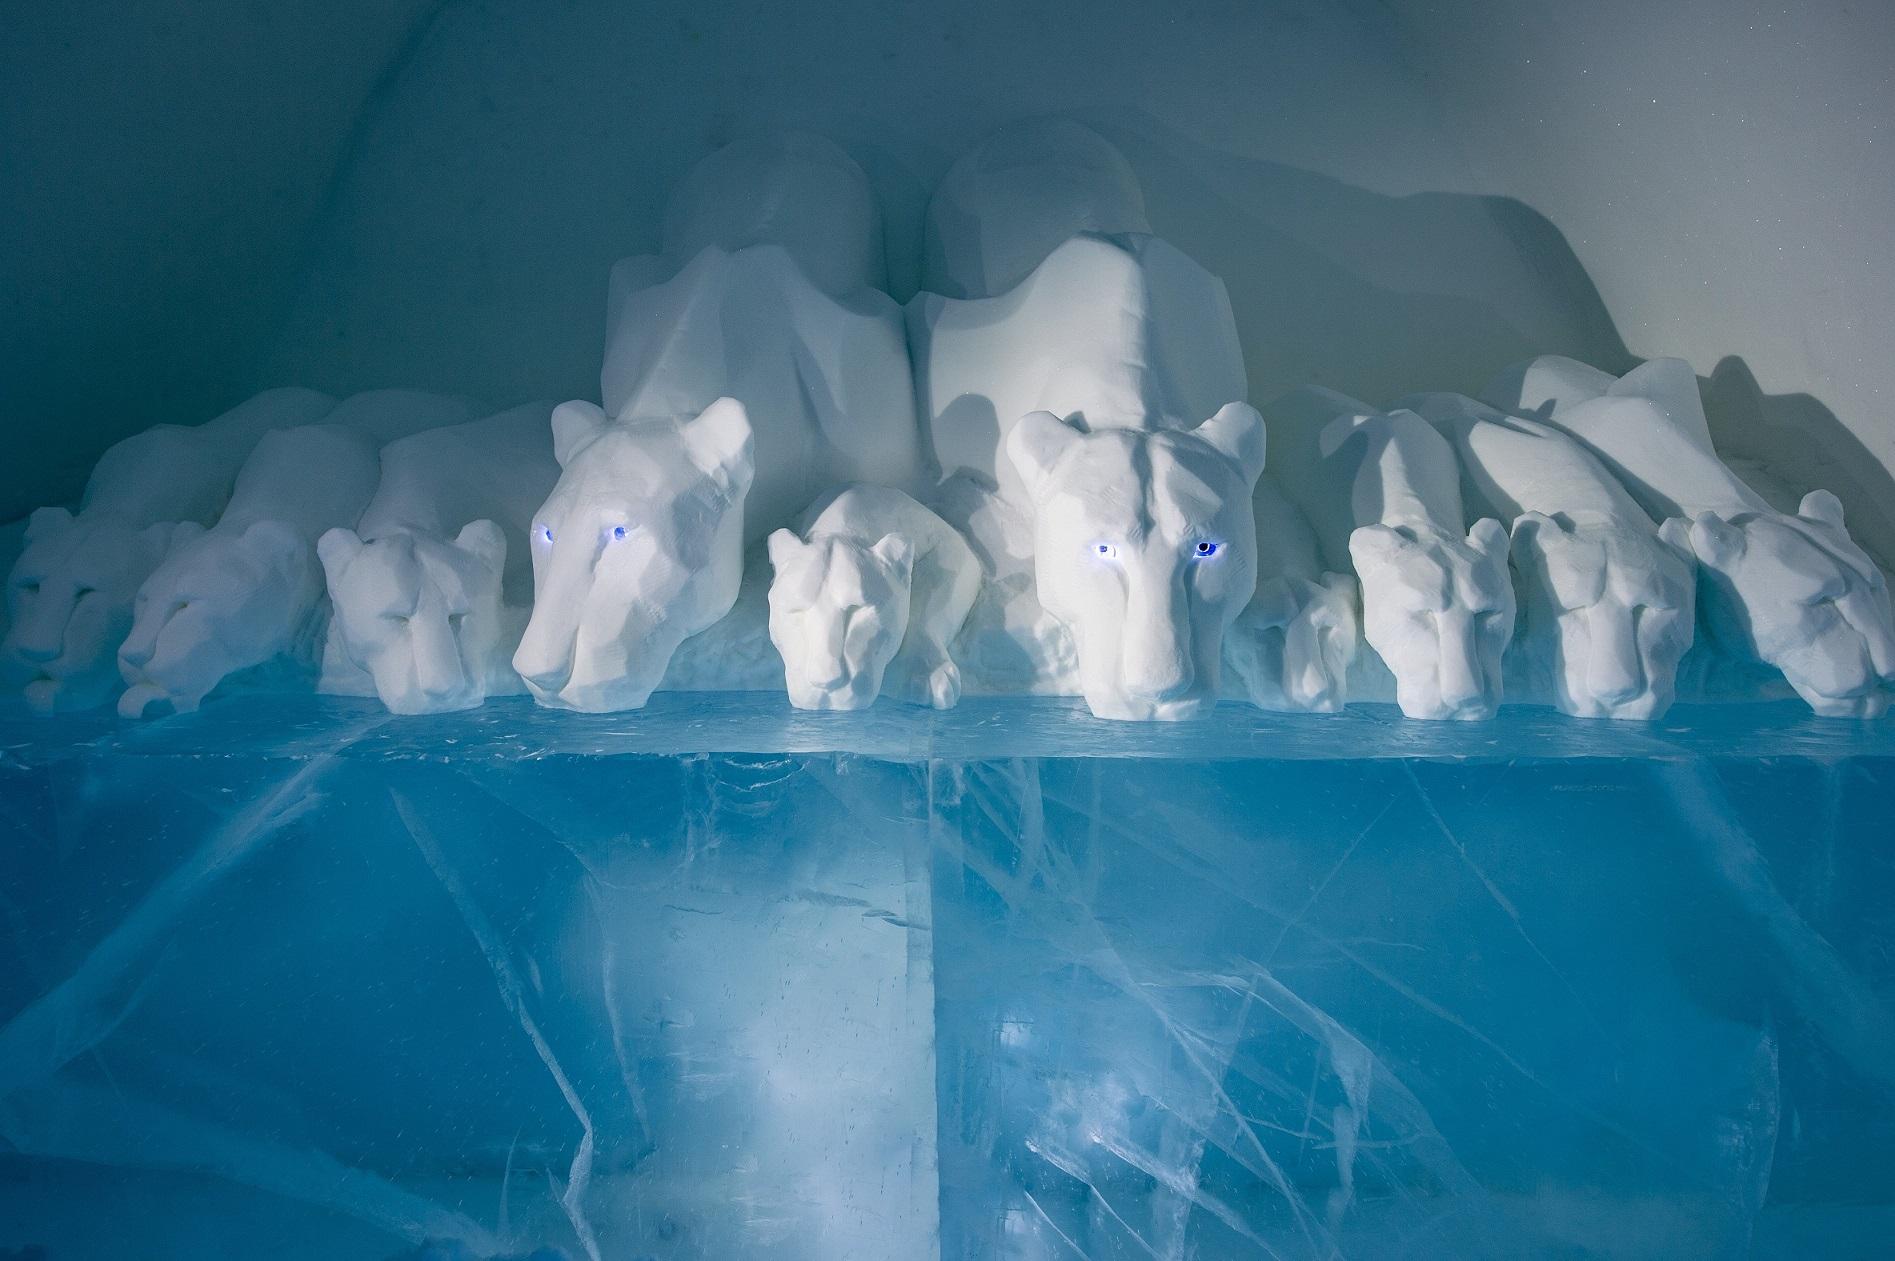 CLEAR WATER Credit Anna Sofia Maag Niklas Byman Asaf Kliger Icehotel